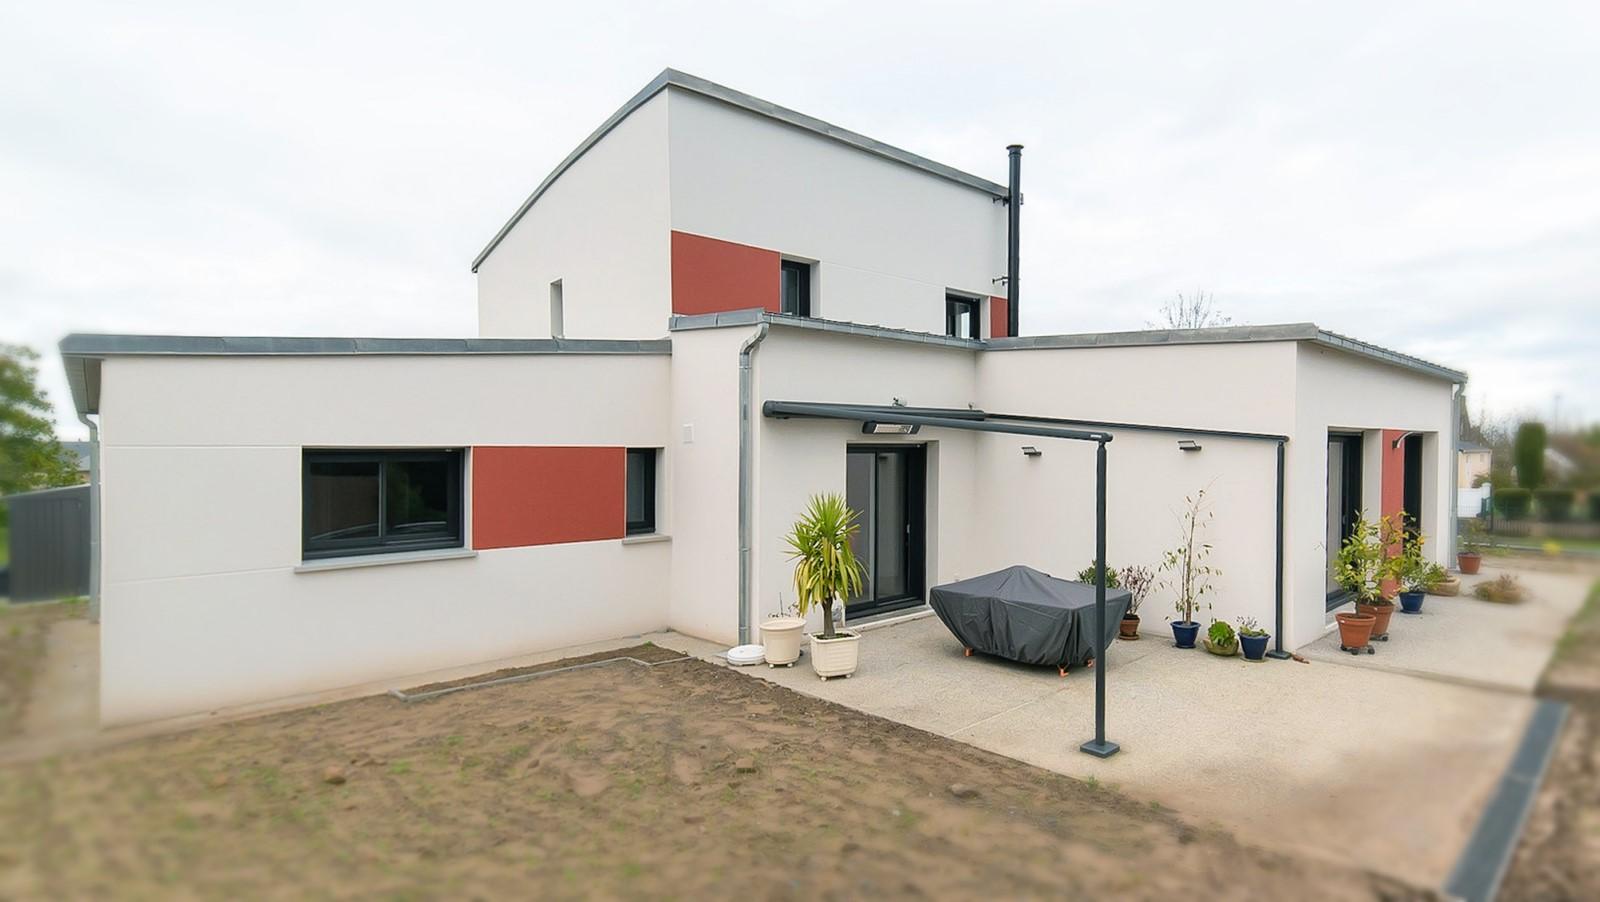 Photographe immobilier et chantier en Gironde